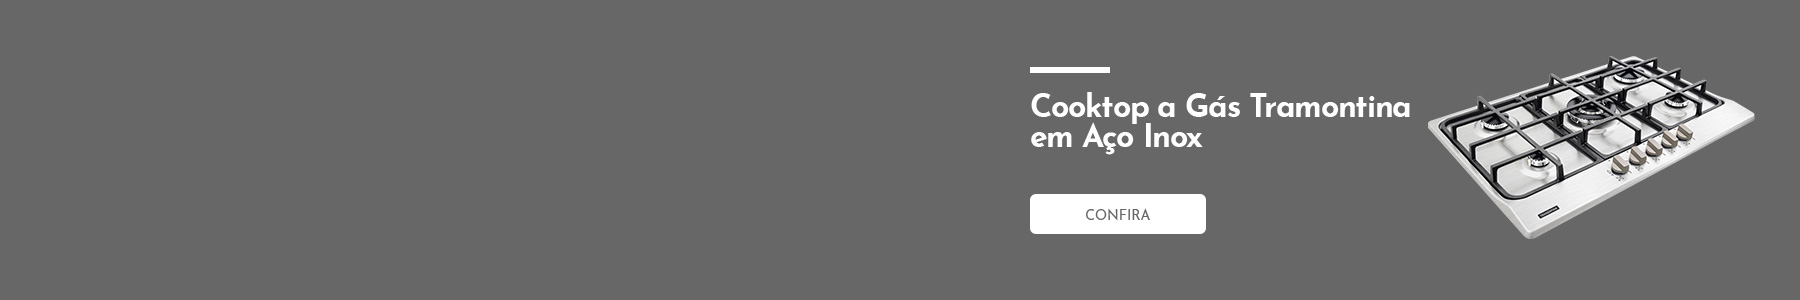 Carrossel Categoria - 2 banner